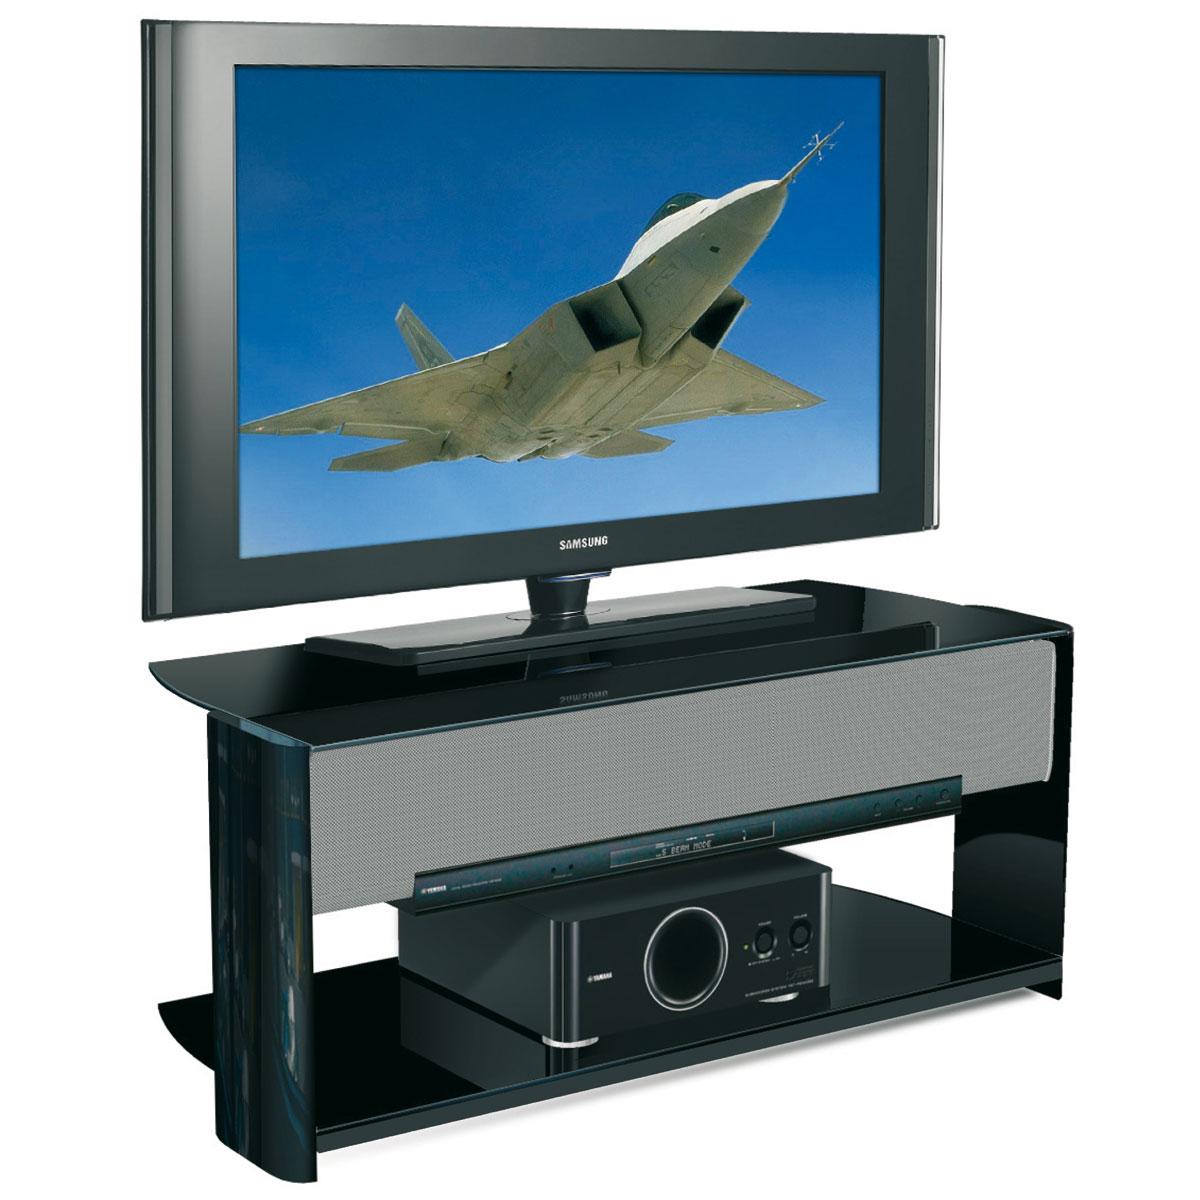 Yamaha yef fny1000 meuble tv yamaha sur for Meuble yamaha